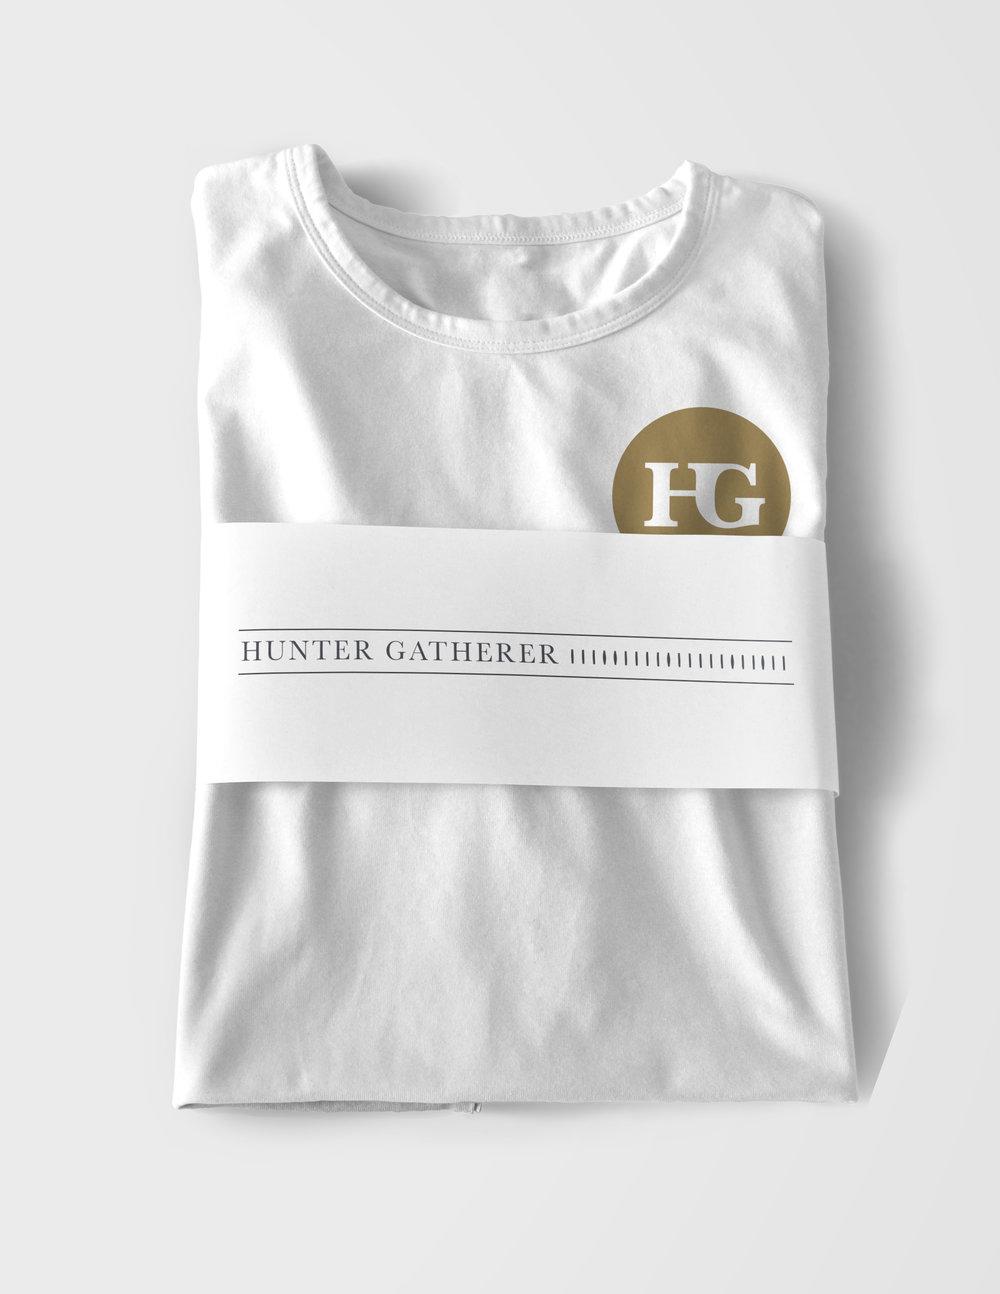 huntergatherer_web_tshirt1.jpg